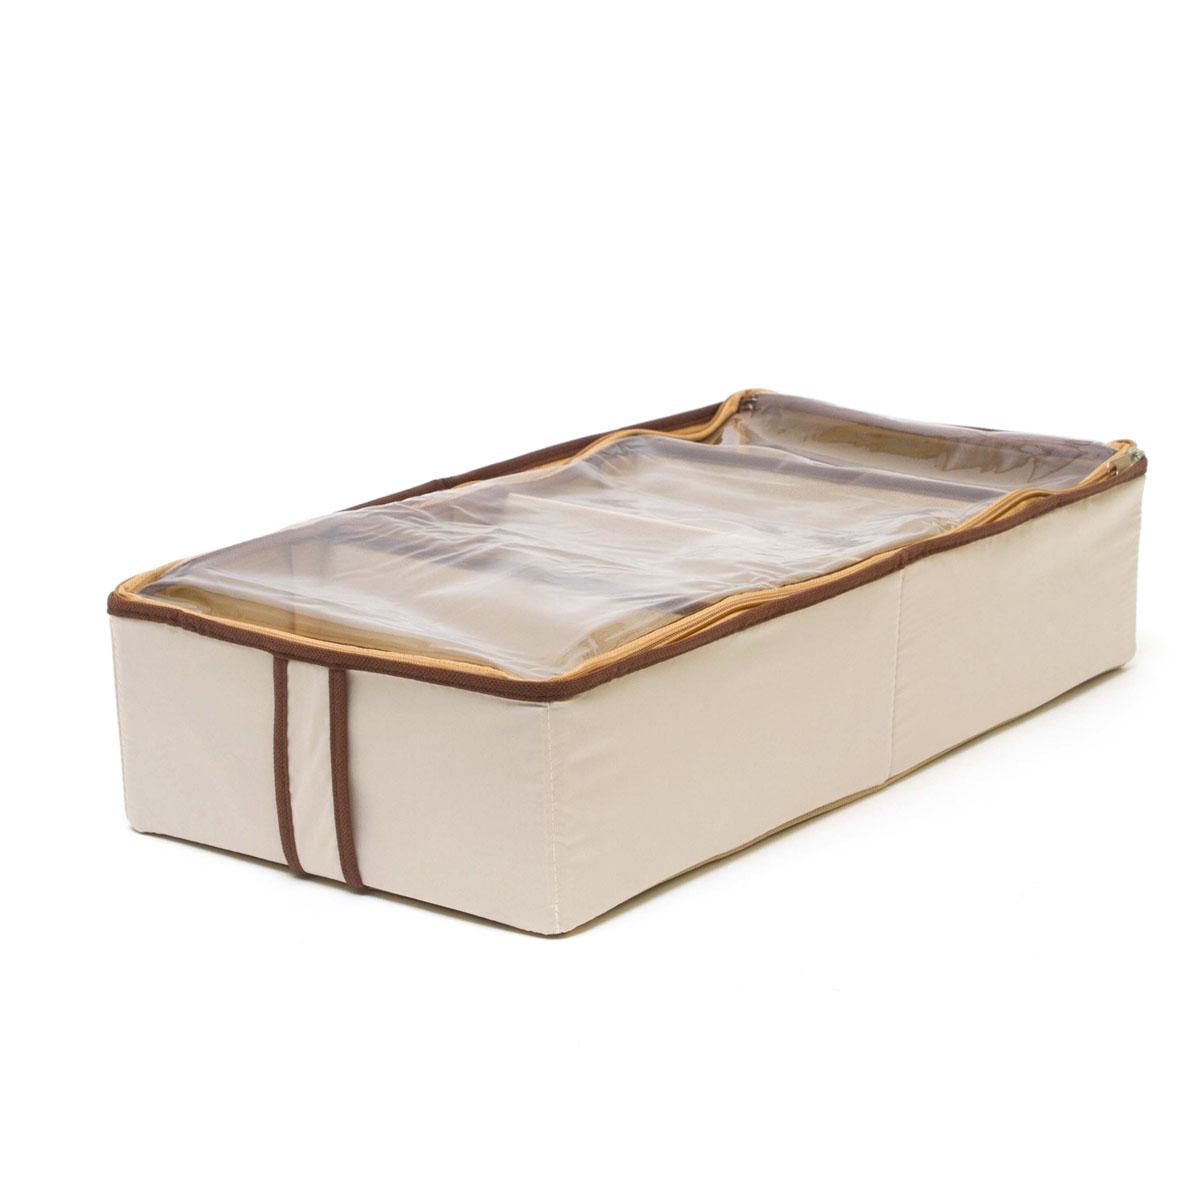 Органайзер для хранения обуви Homsu Bora-Bora, 52 х 26 х 12 см органайзер для хранения нижнего белья homsu bora bora 6 секций 35 x 35 x 10 см